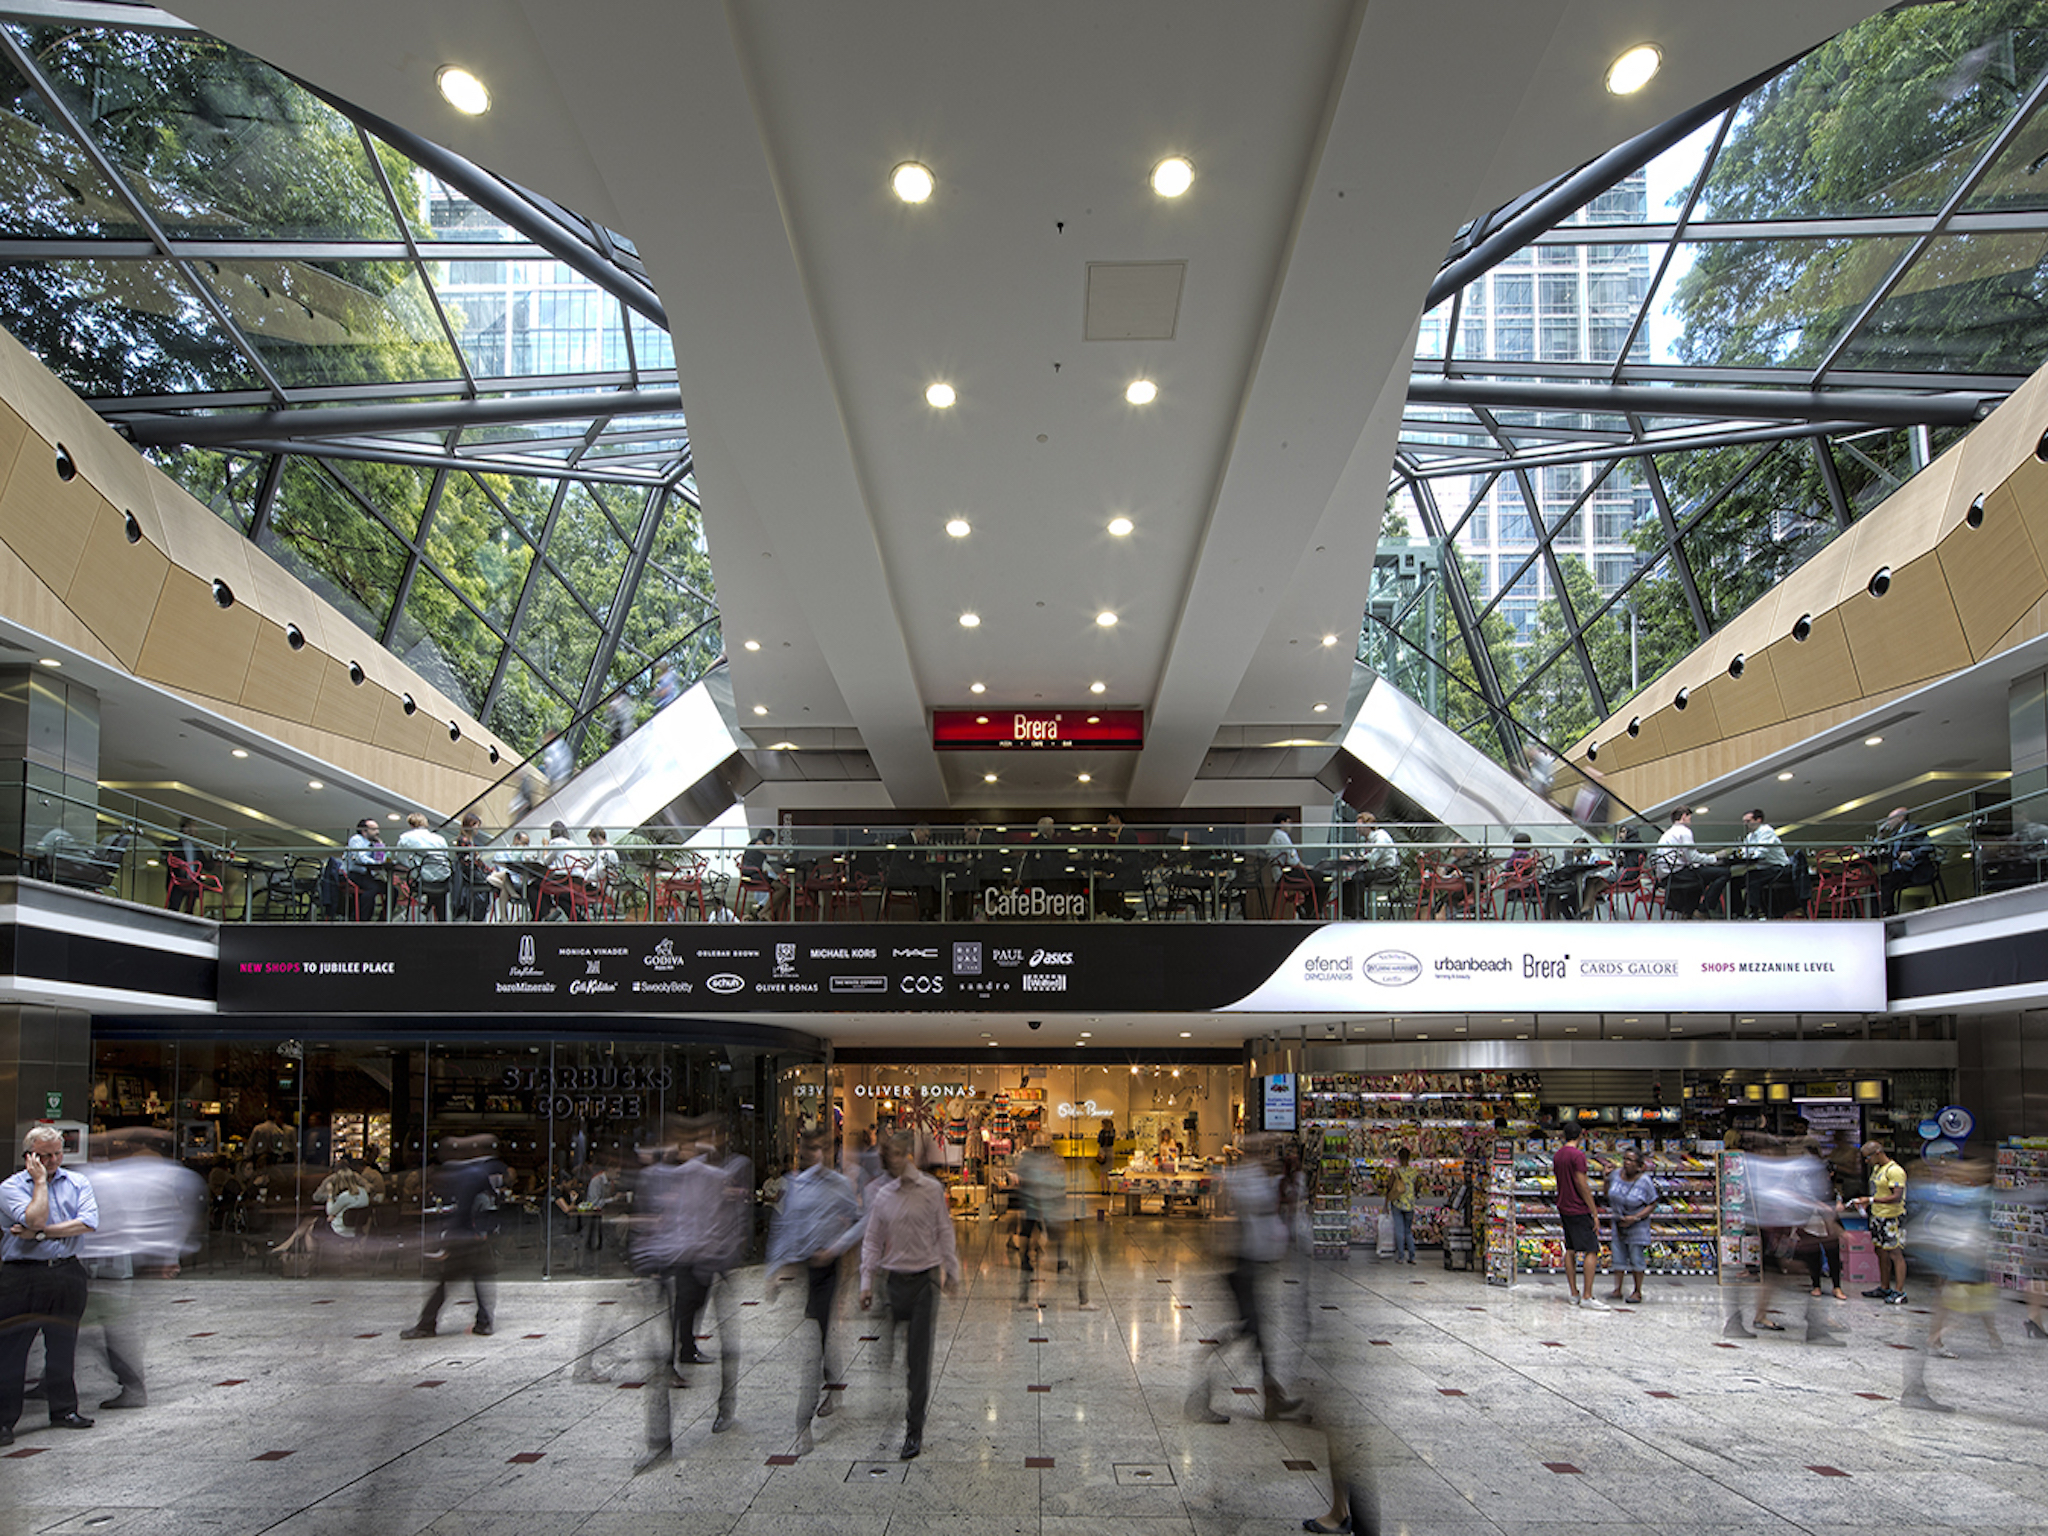 Canary Wharf Shopping Centre